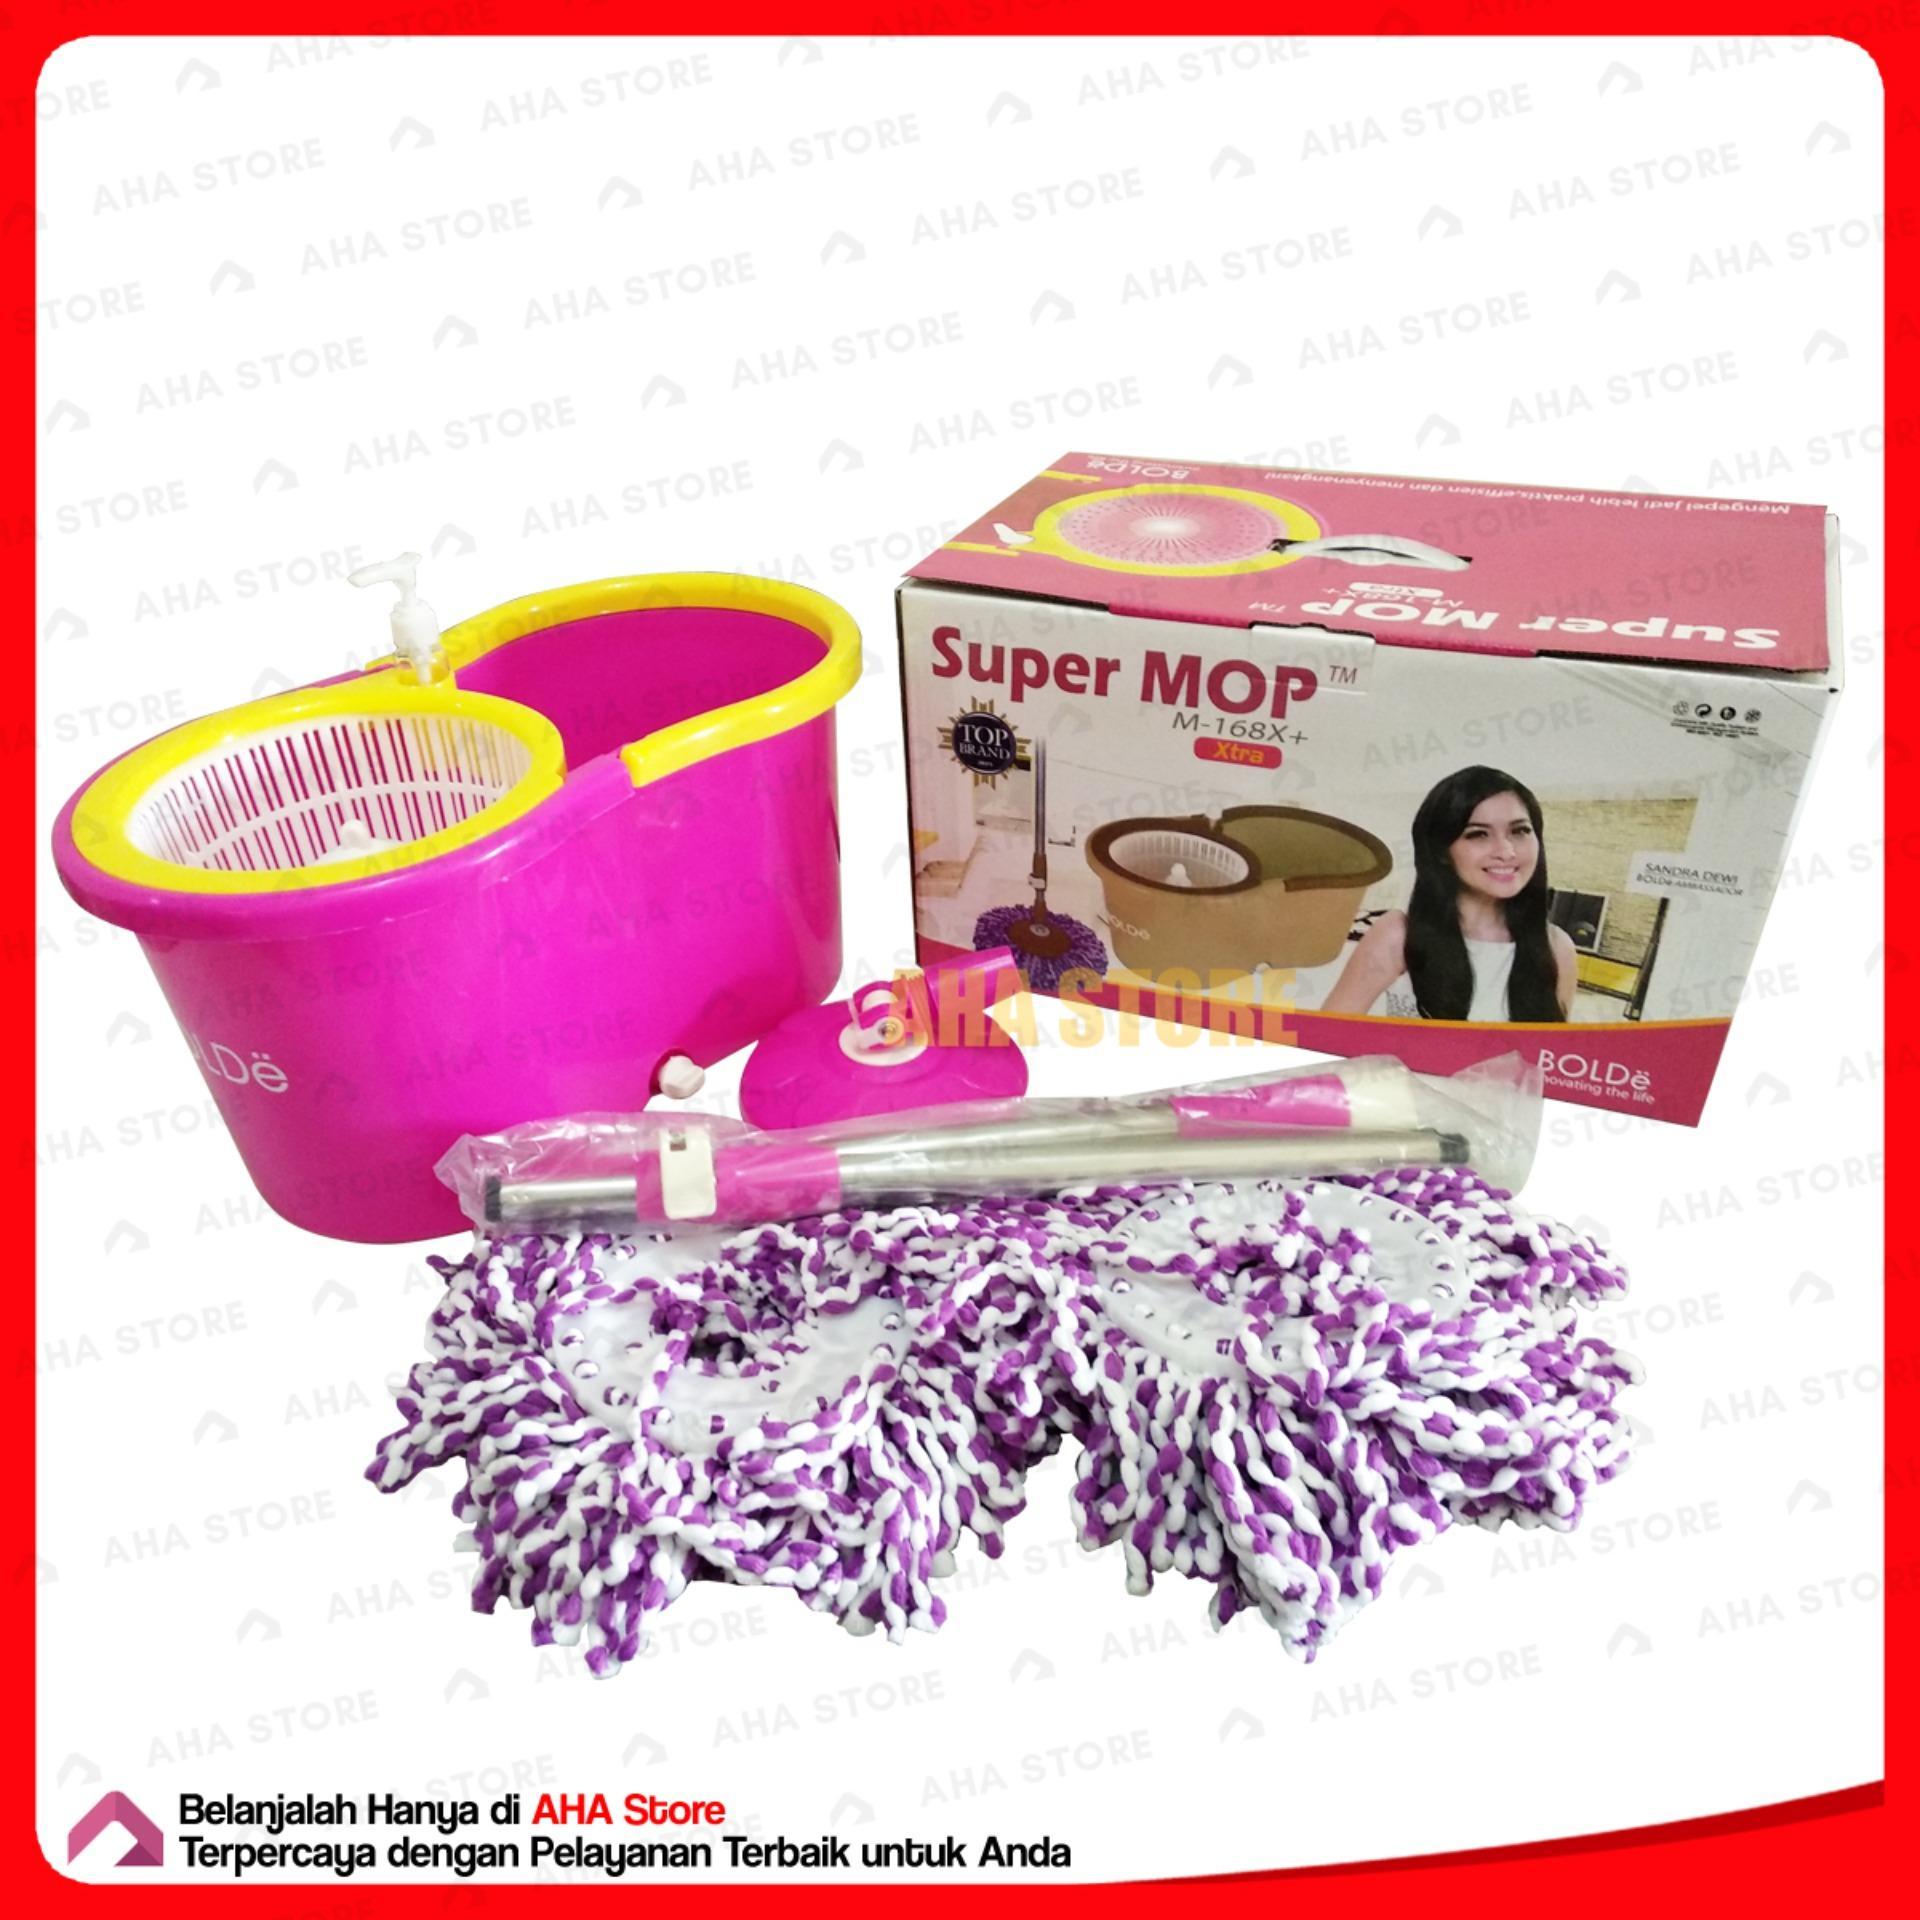 Bolde Super Mop M-168X+ X-Tra Pel Lantai - Merah Muda - 2 ...